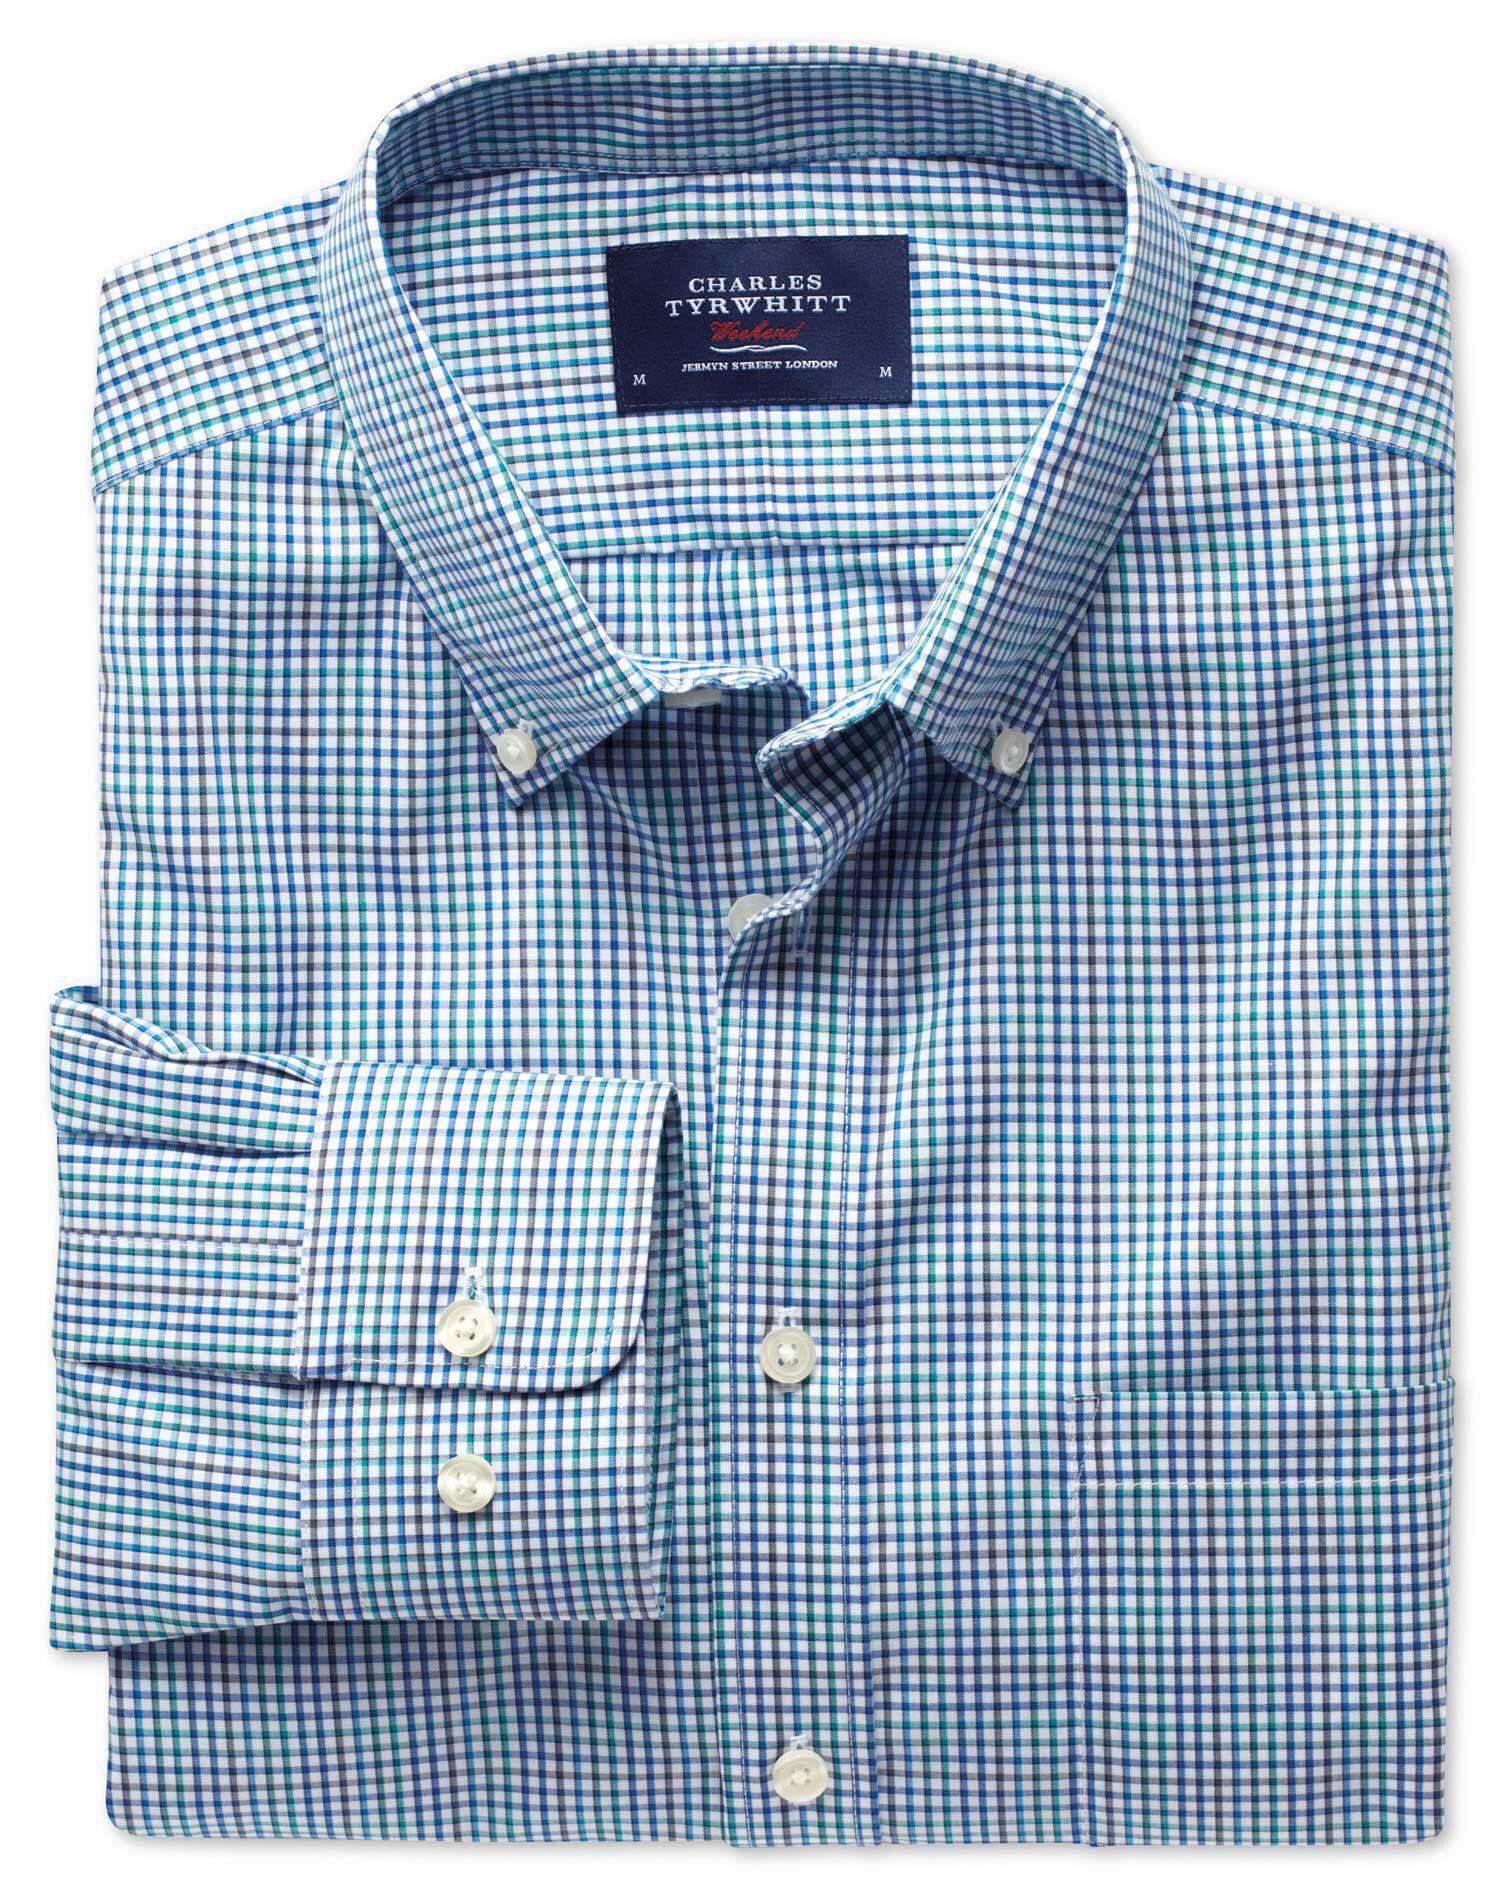 Classic Fit Non-Iron Poplin Multi Check Blue Cotton Shirt Single Cuff Size Large by Charles Tyrwhitt